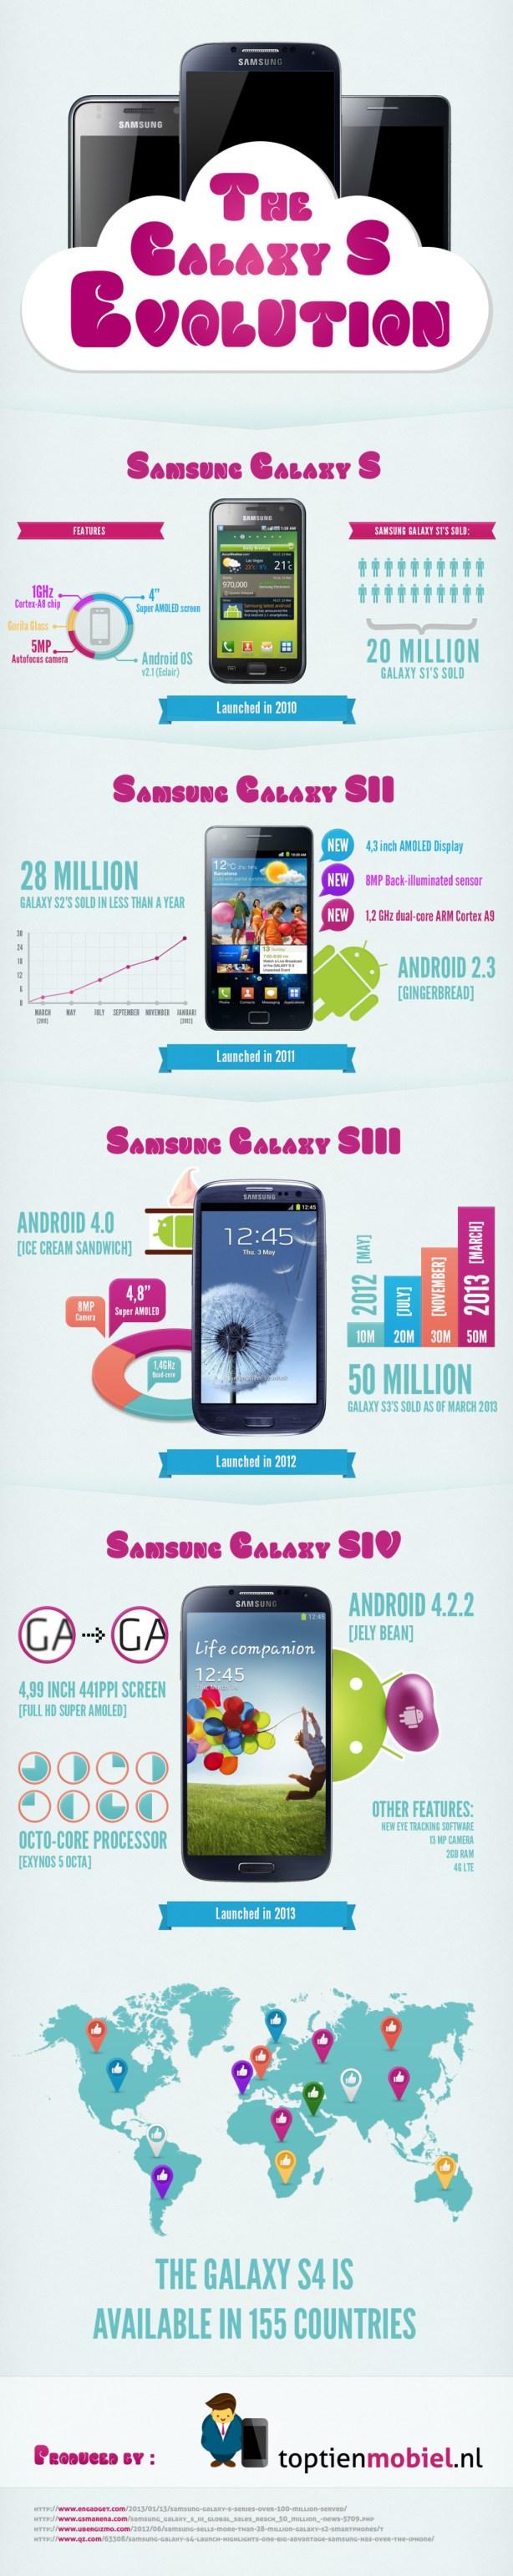 samsung-galaxy-s-evolution-infographic